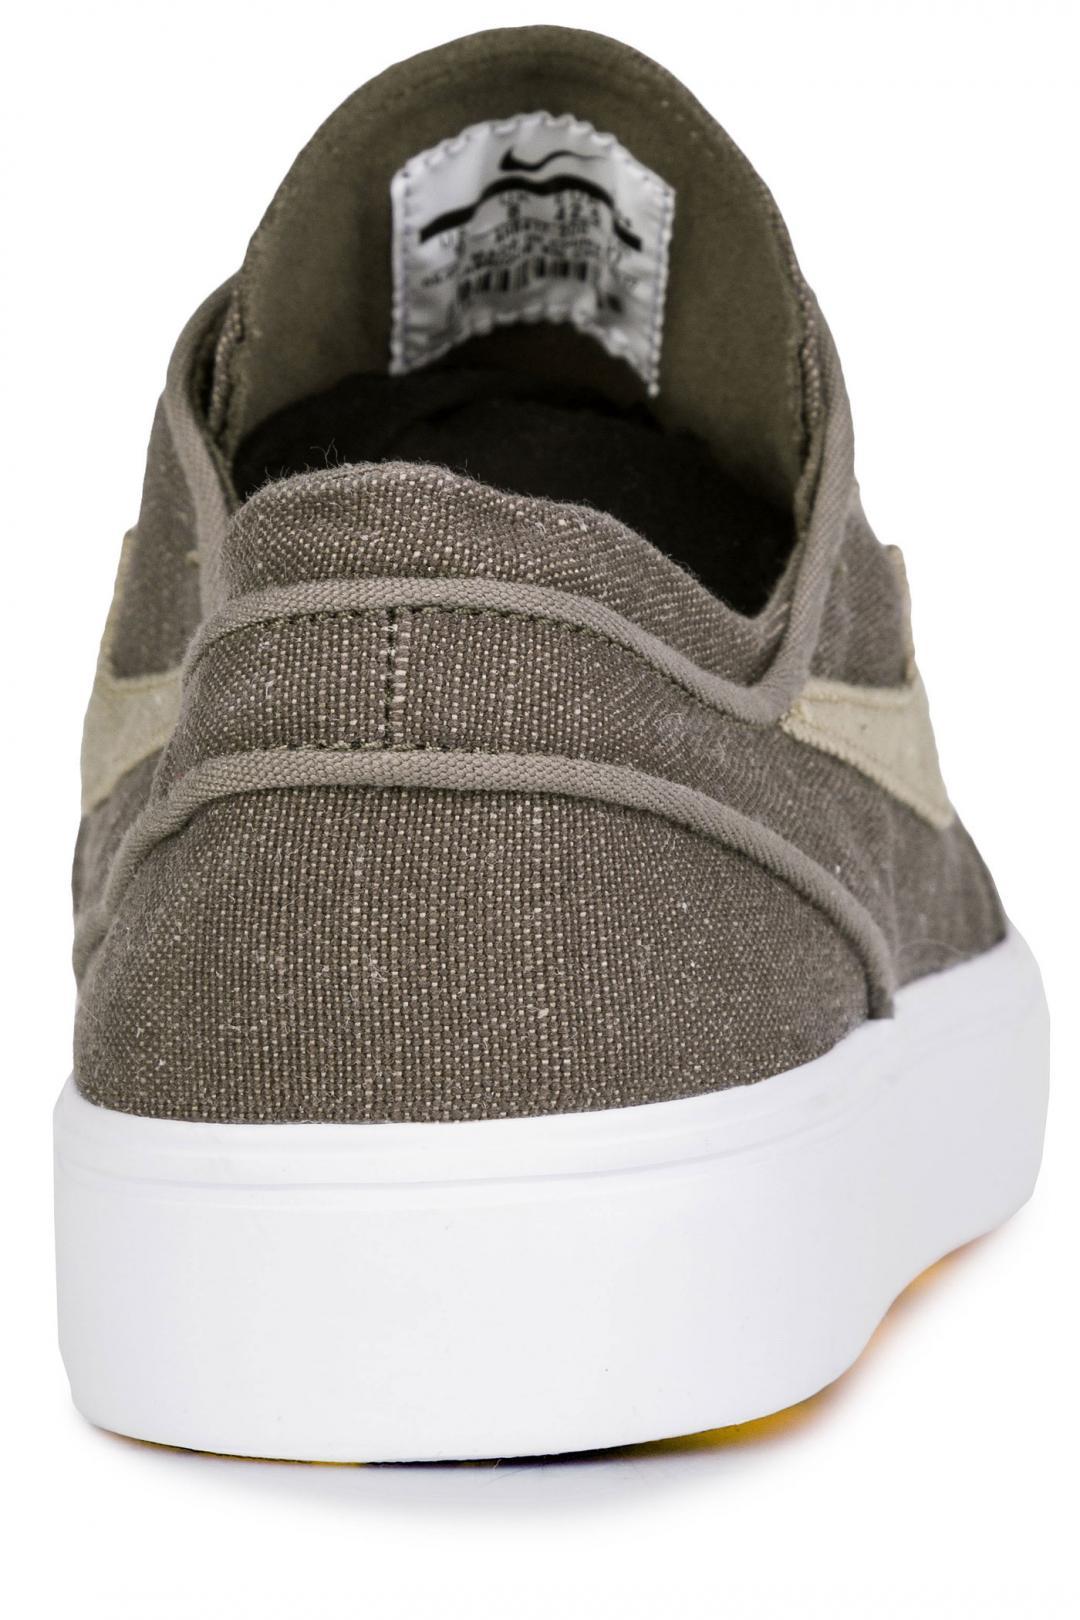 Uomo Nike SB Zoom Stefan Janoski Canvas Deconstructed ridgerock khaki   Sneakers low top